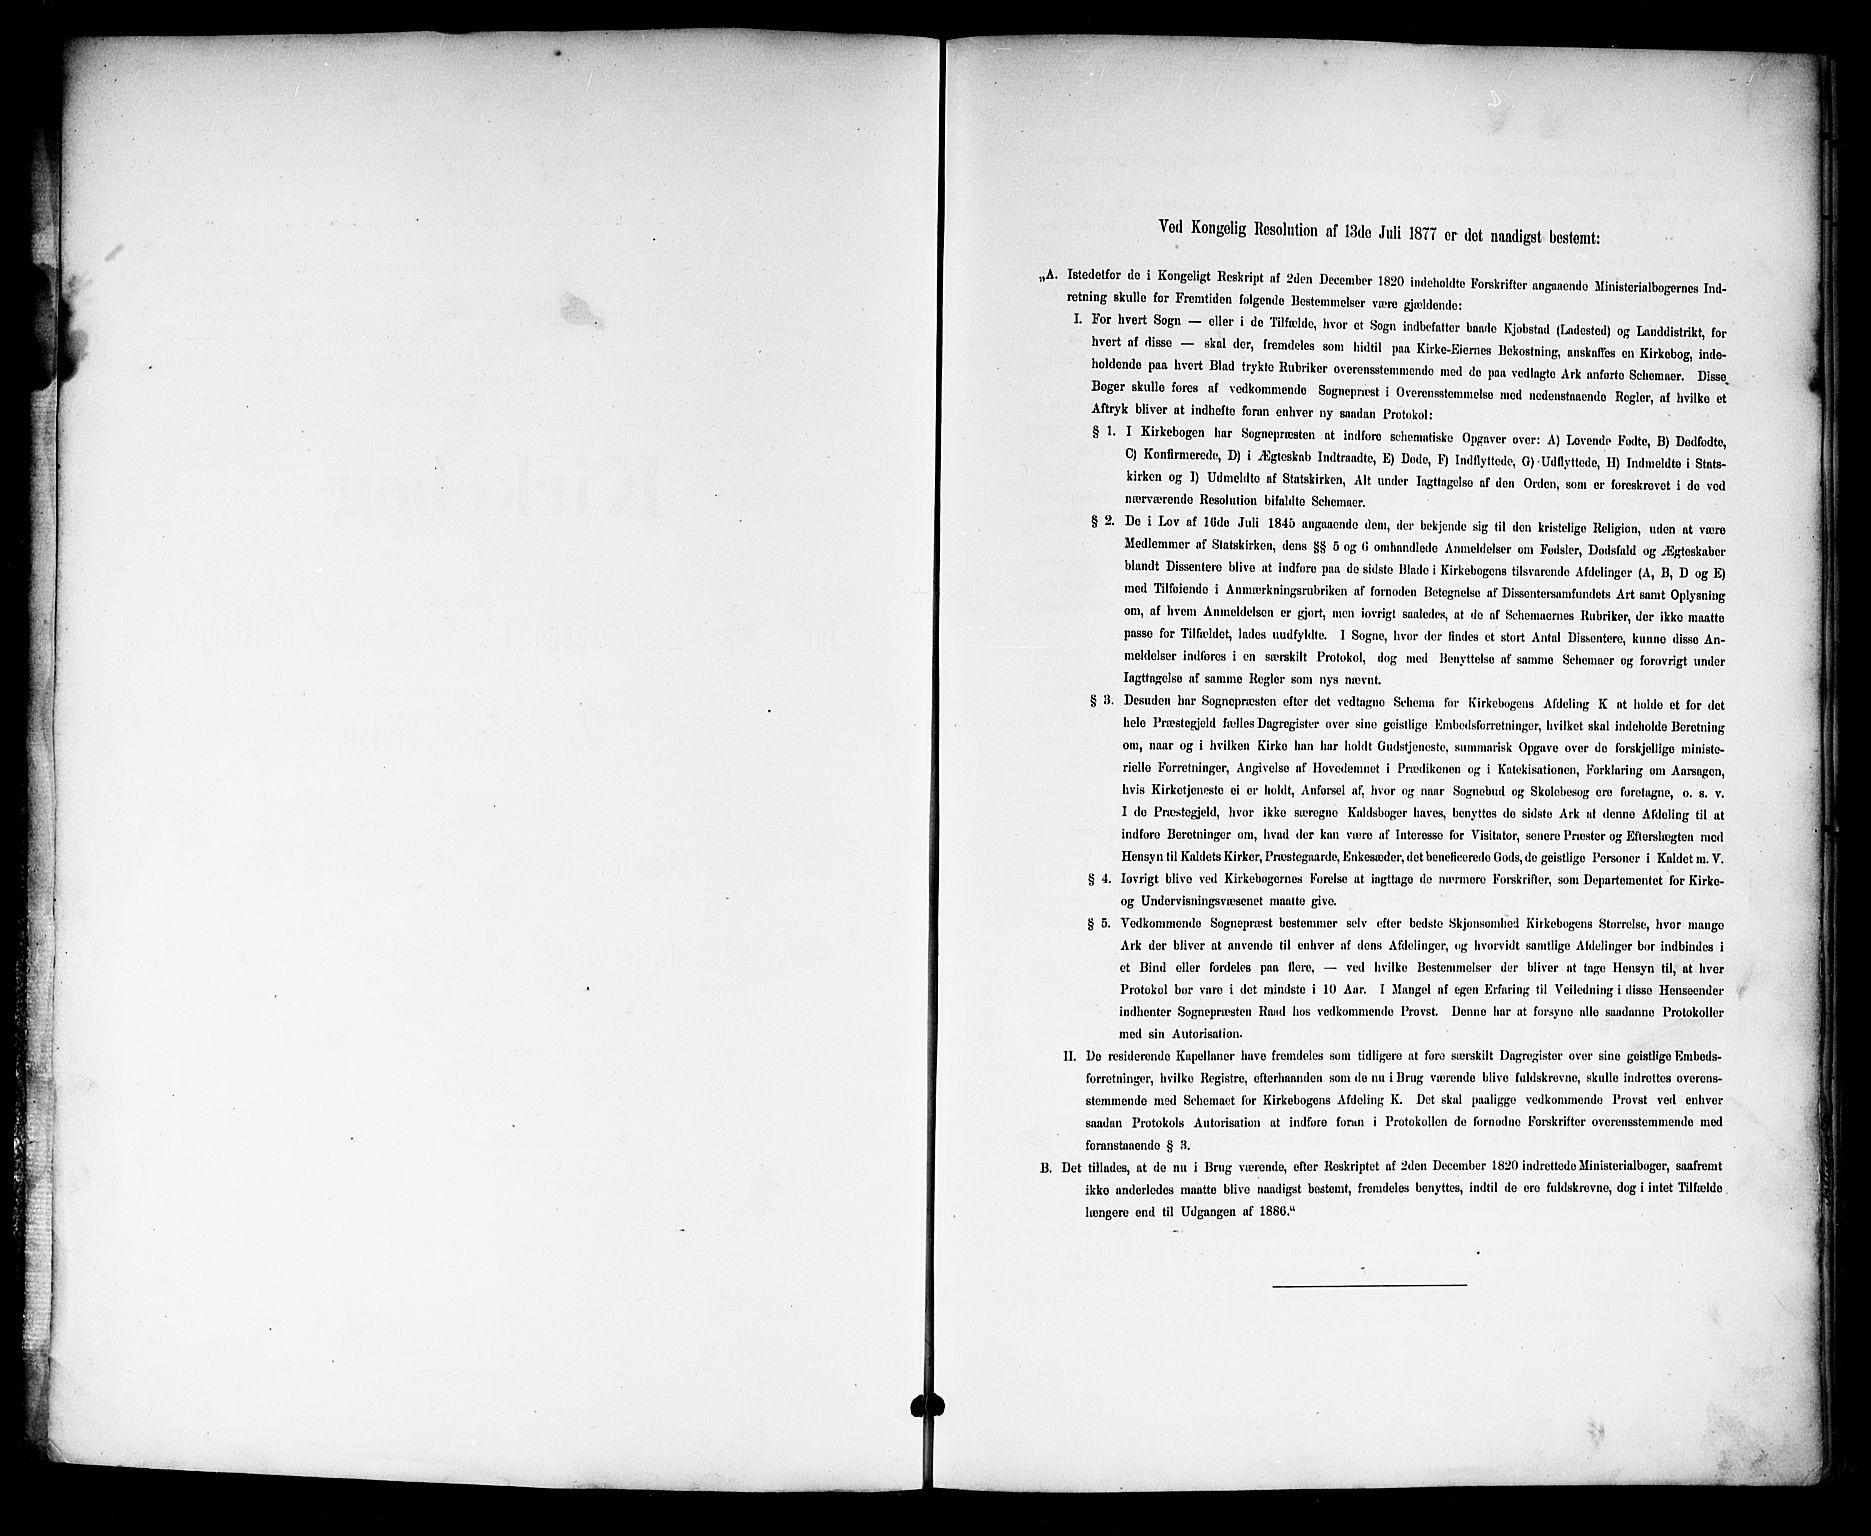 SAKO, Drangedal kirkebøker, G/Gb/L0002: Klokkerbok nr. II 2, 1895-1918